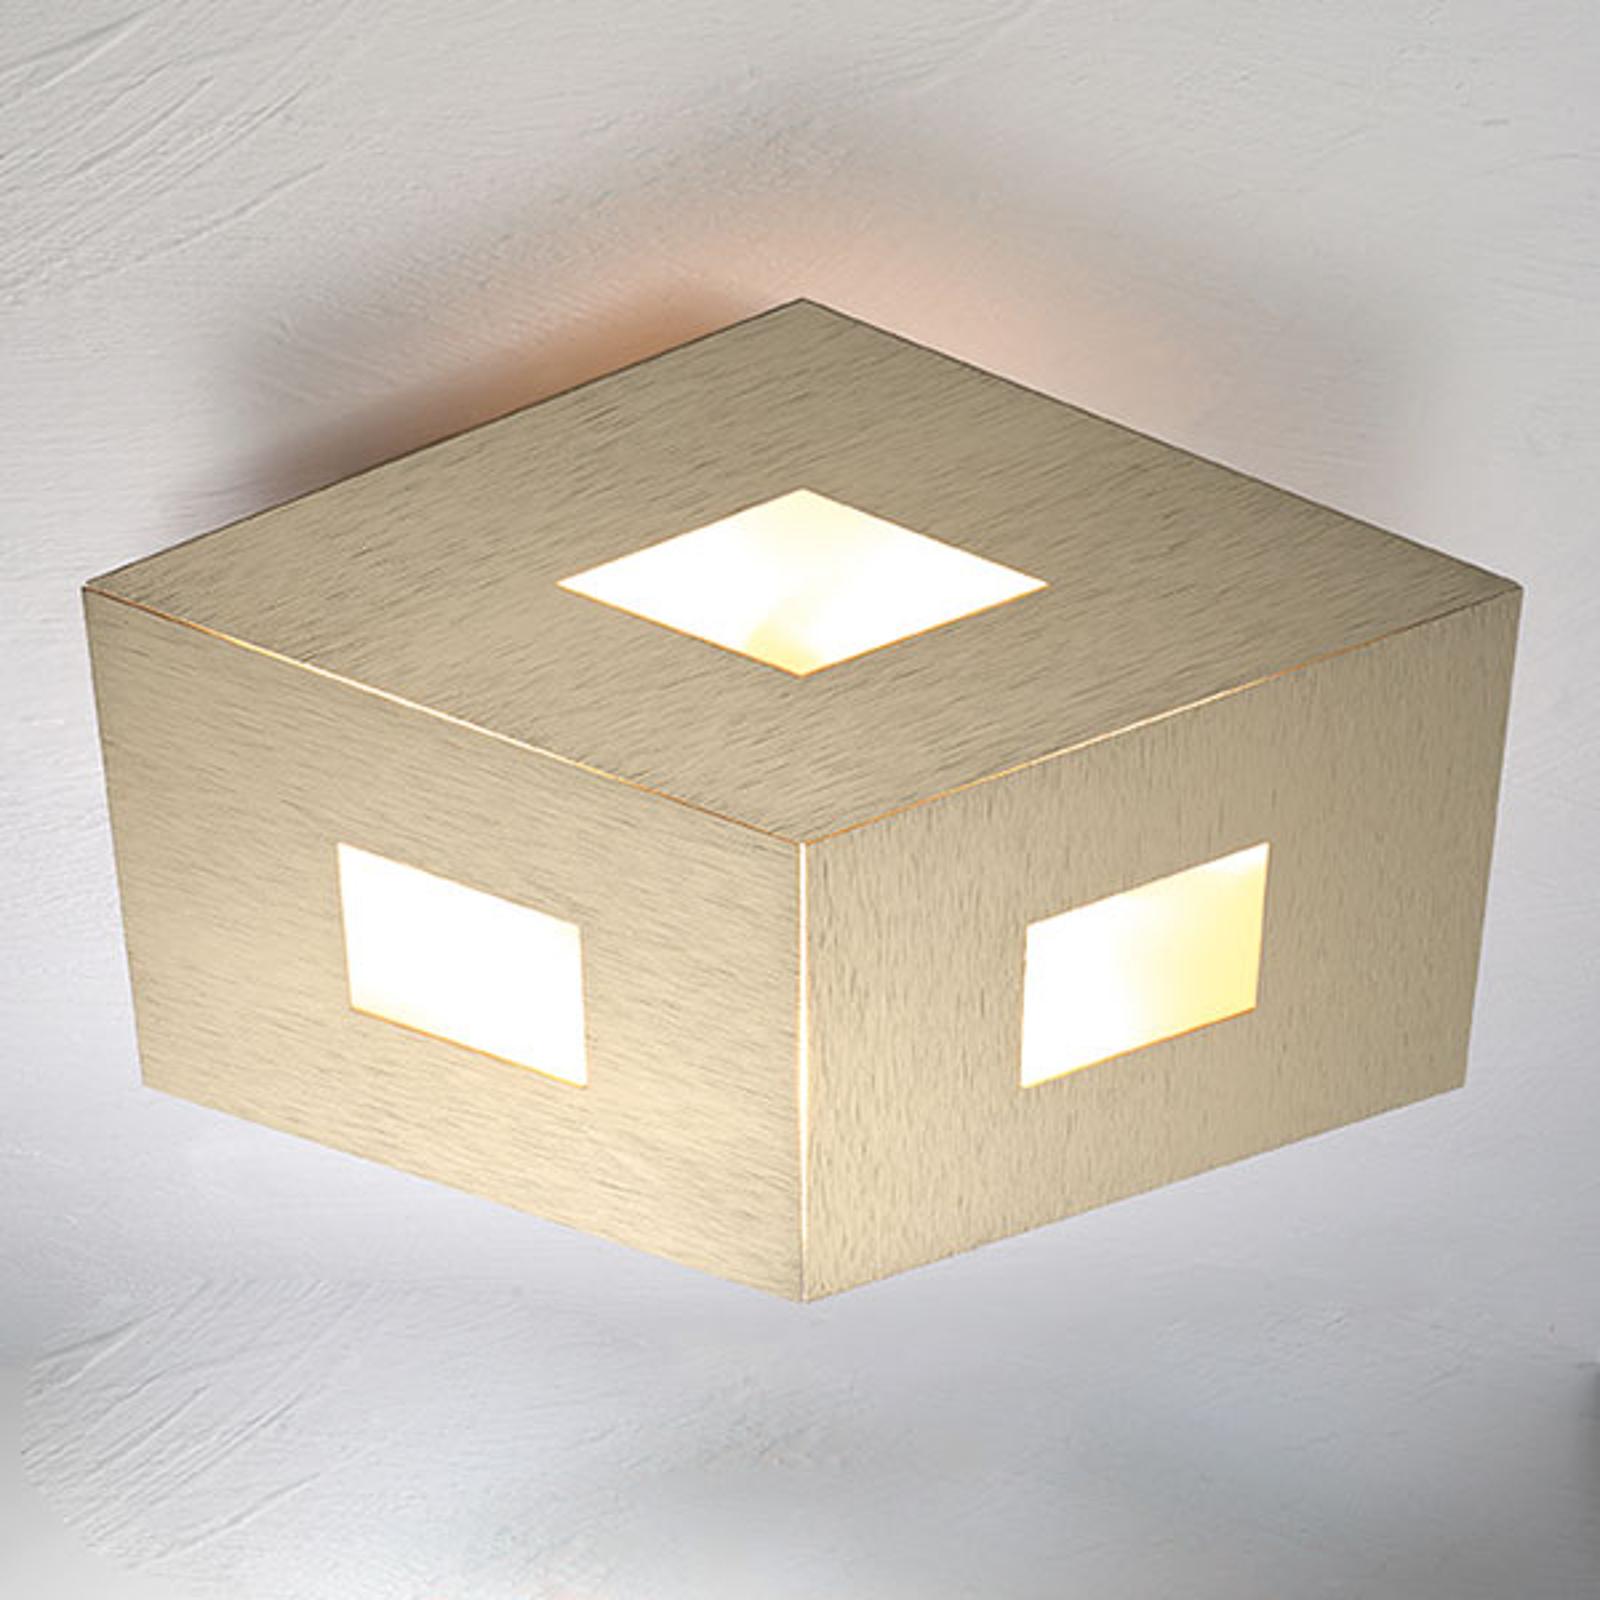 Bopp box Comfort LED plafondlamp goud 45cm